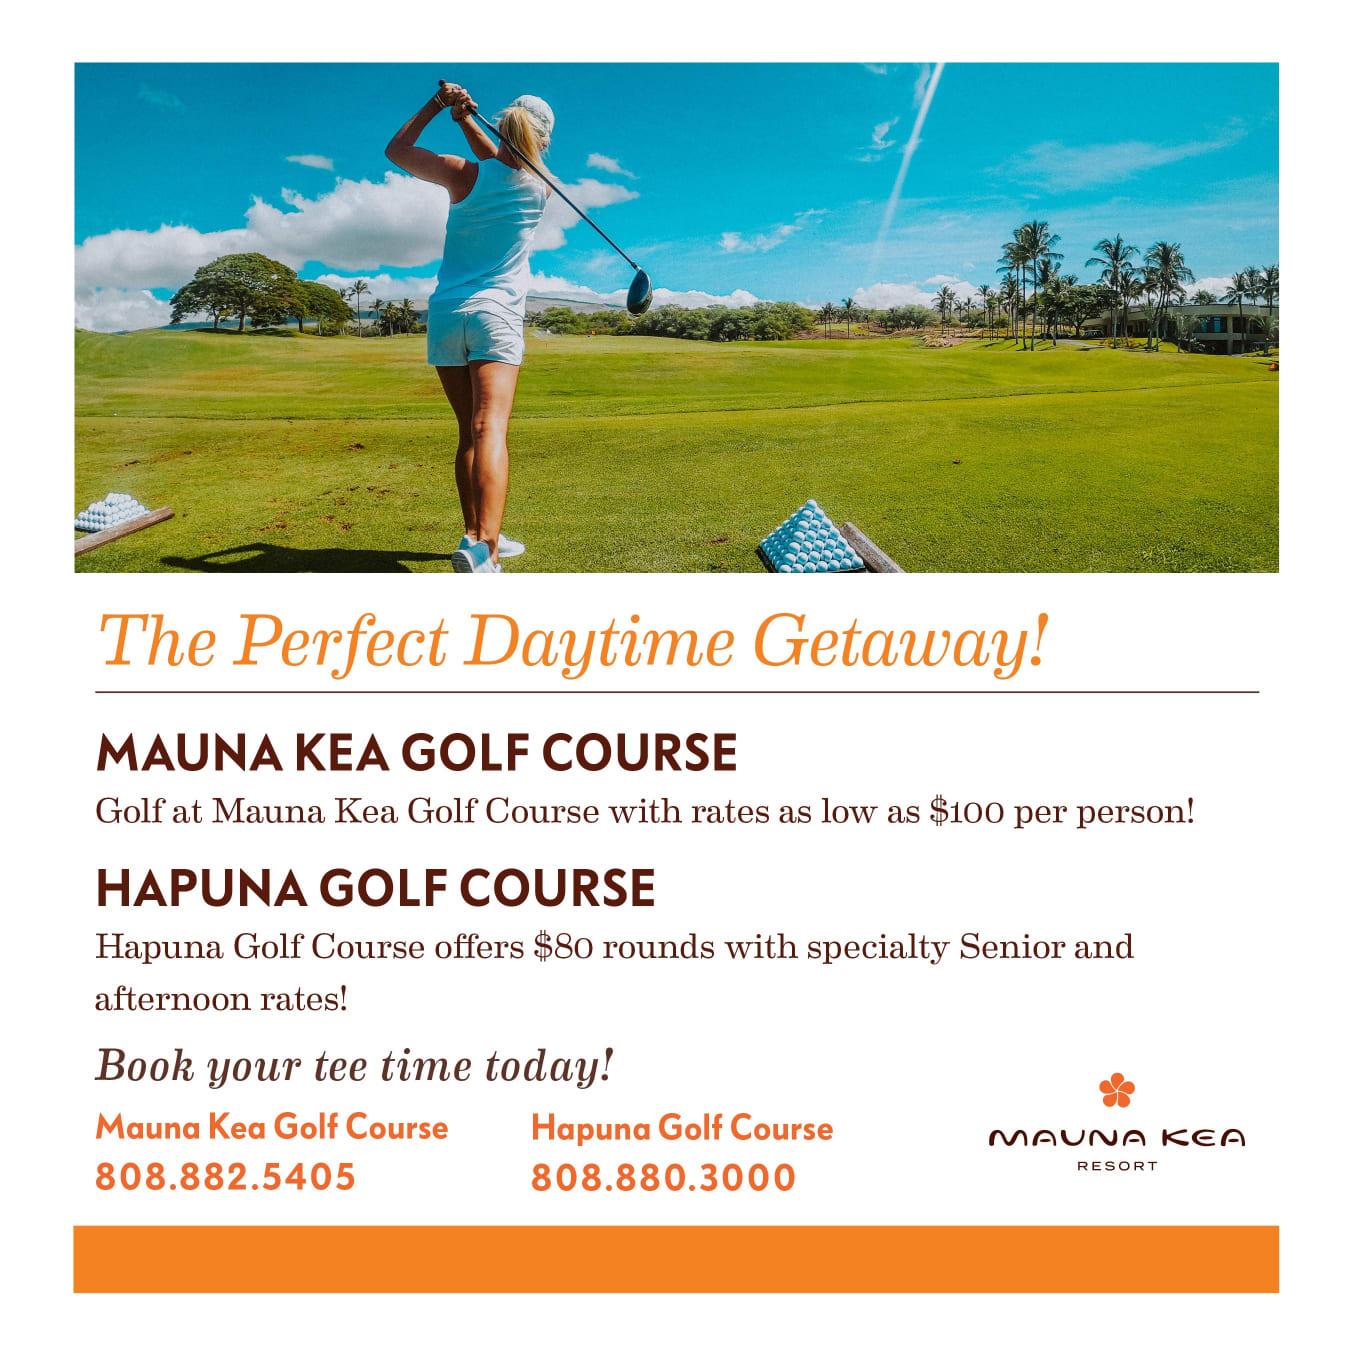 Mauna-Kea-Golf-Aug-2020.jpg